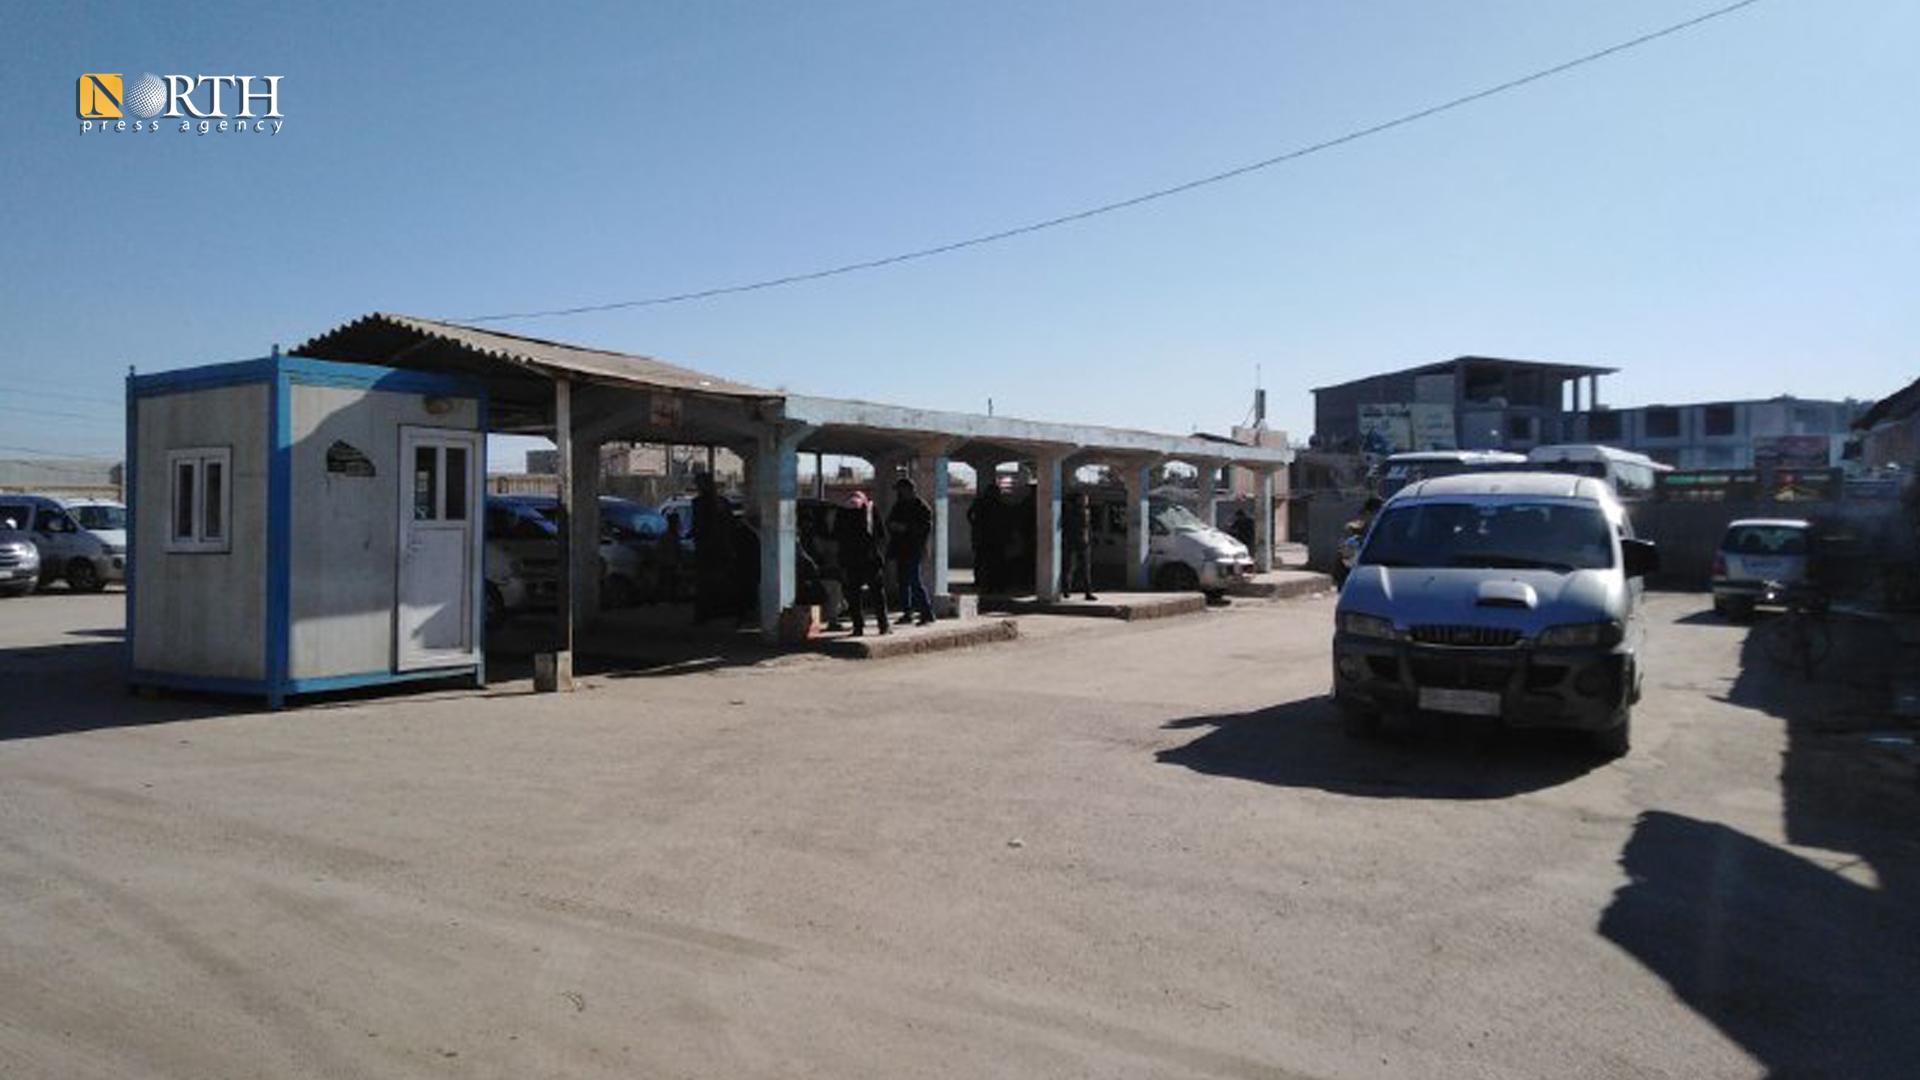 al-Sina'a garage in the city of Qamishli, northeast Syria – North Press